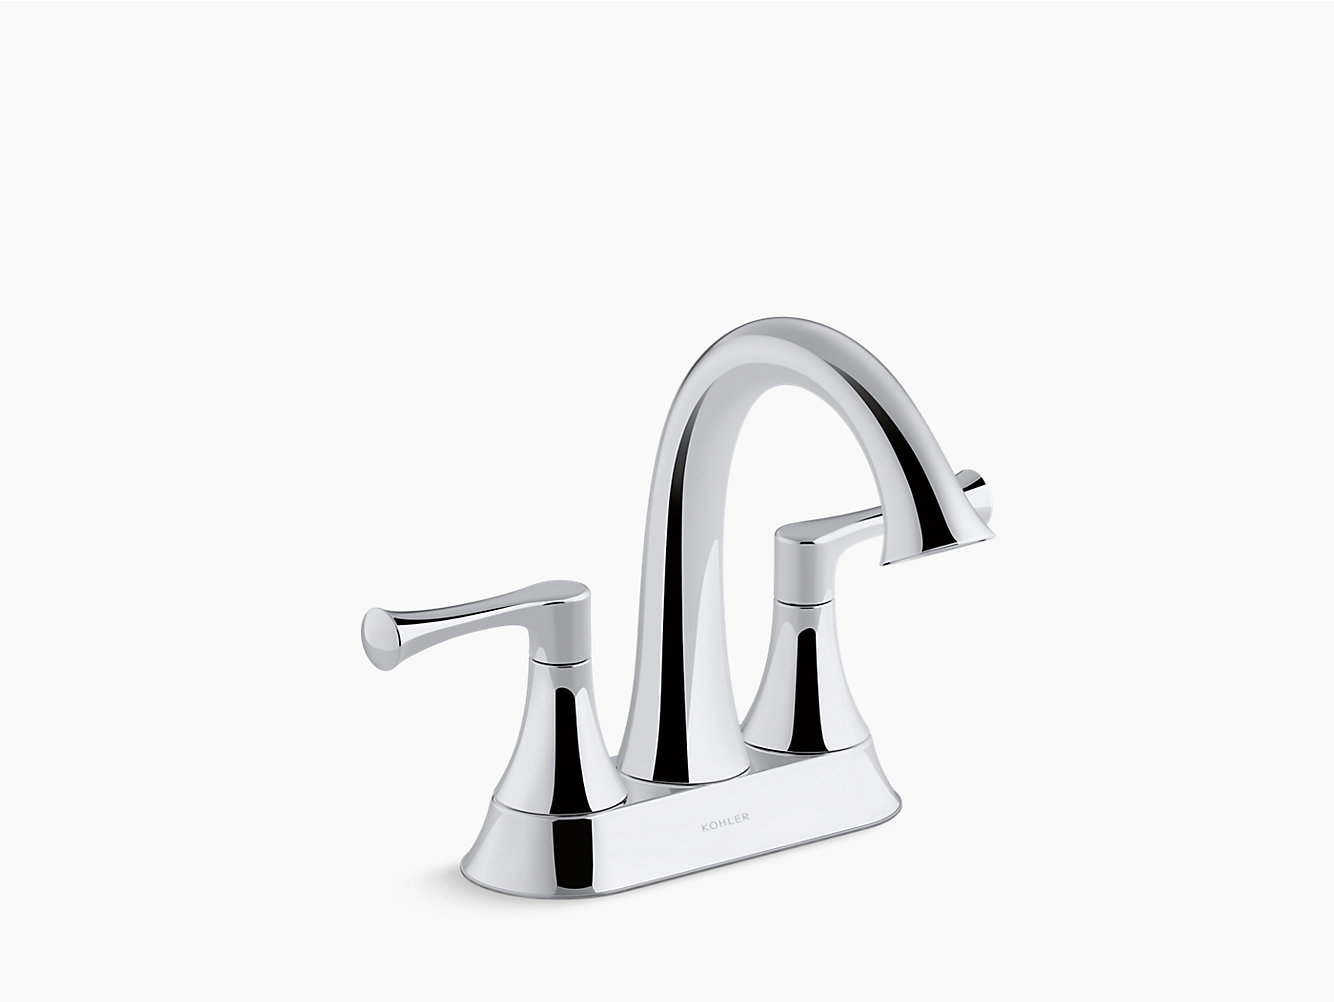 K-R78046-4D   Lilyfield Centerset Bathroom Sink Faucet   KOHLER